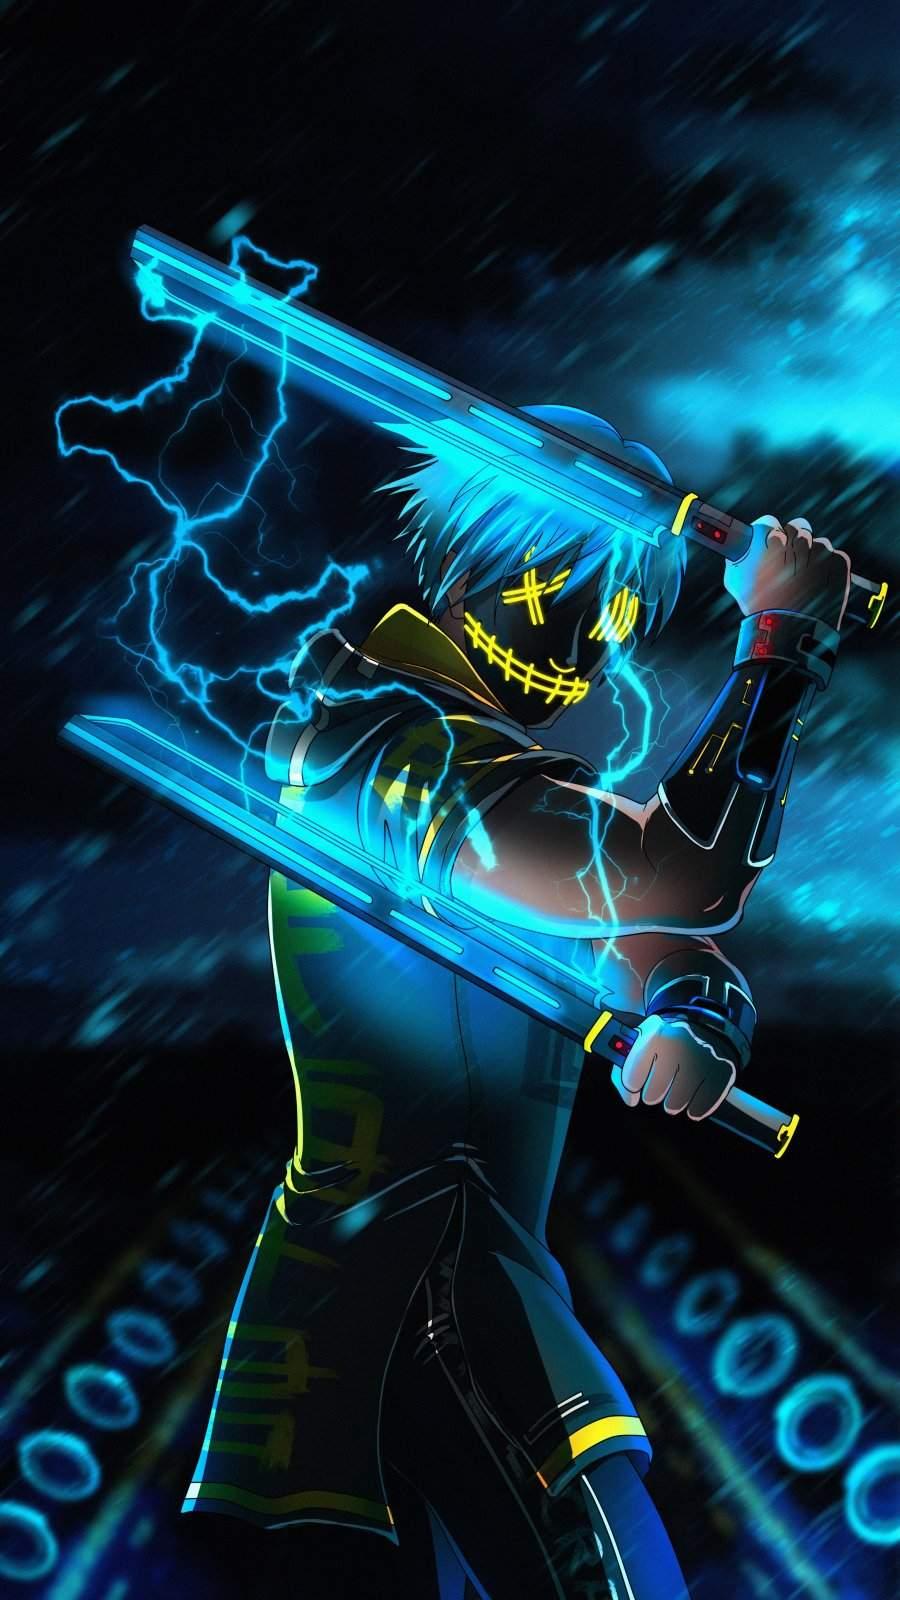 Sword Master Anime iPhone Wallpaper